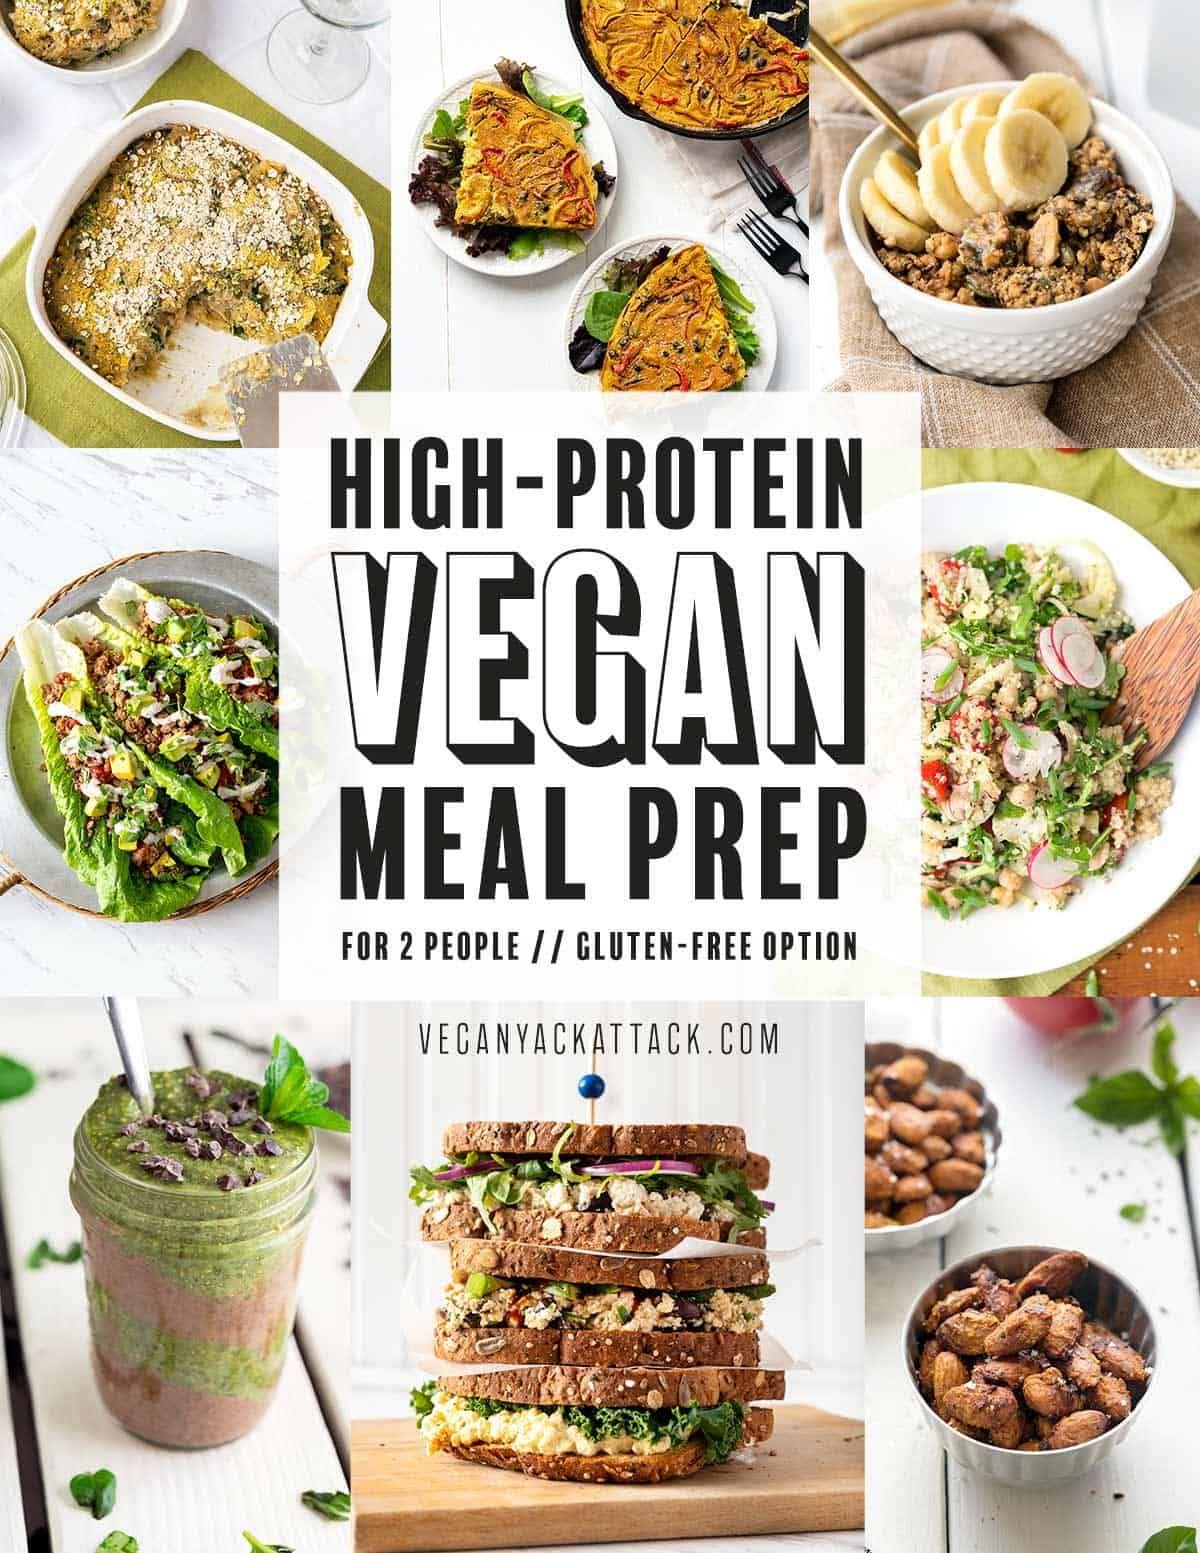 High Protein Vegan Meal Prep In 2020 Vegan Protein Recipes High Protein Vegan Recipes Vegan Meal Plans